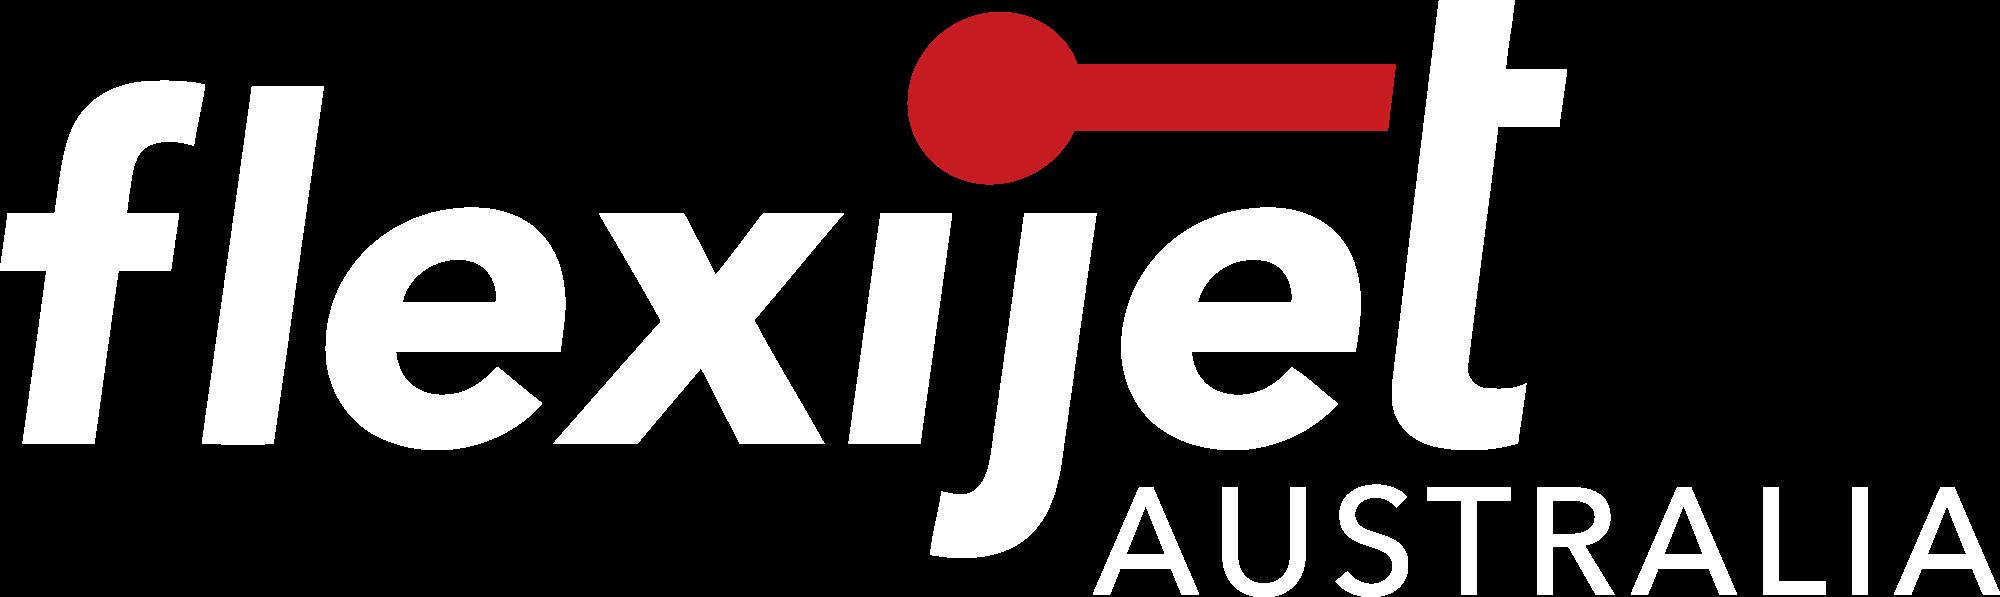 Flexijet Australia logo.